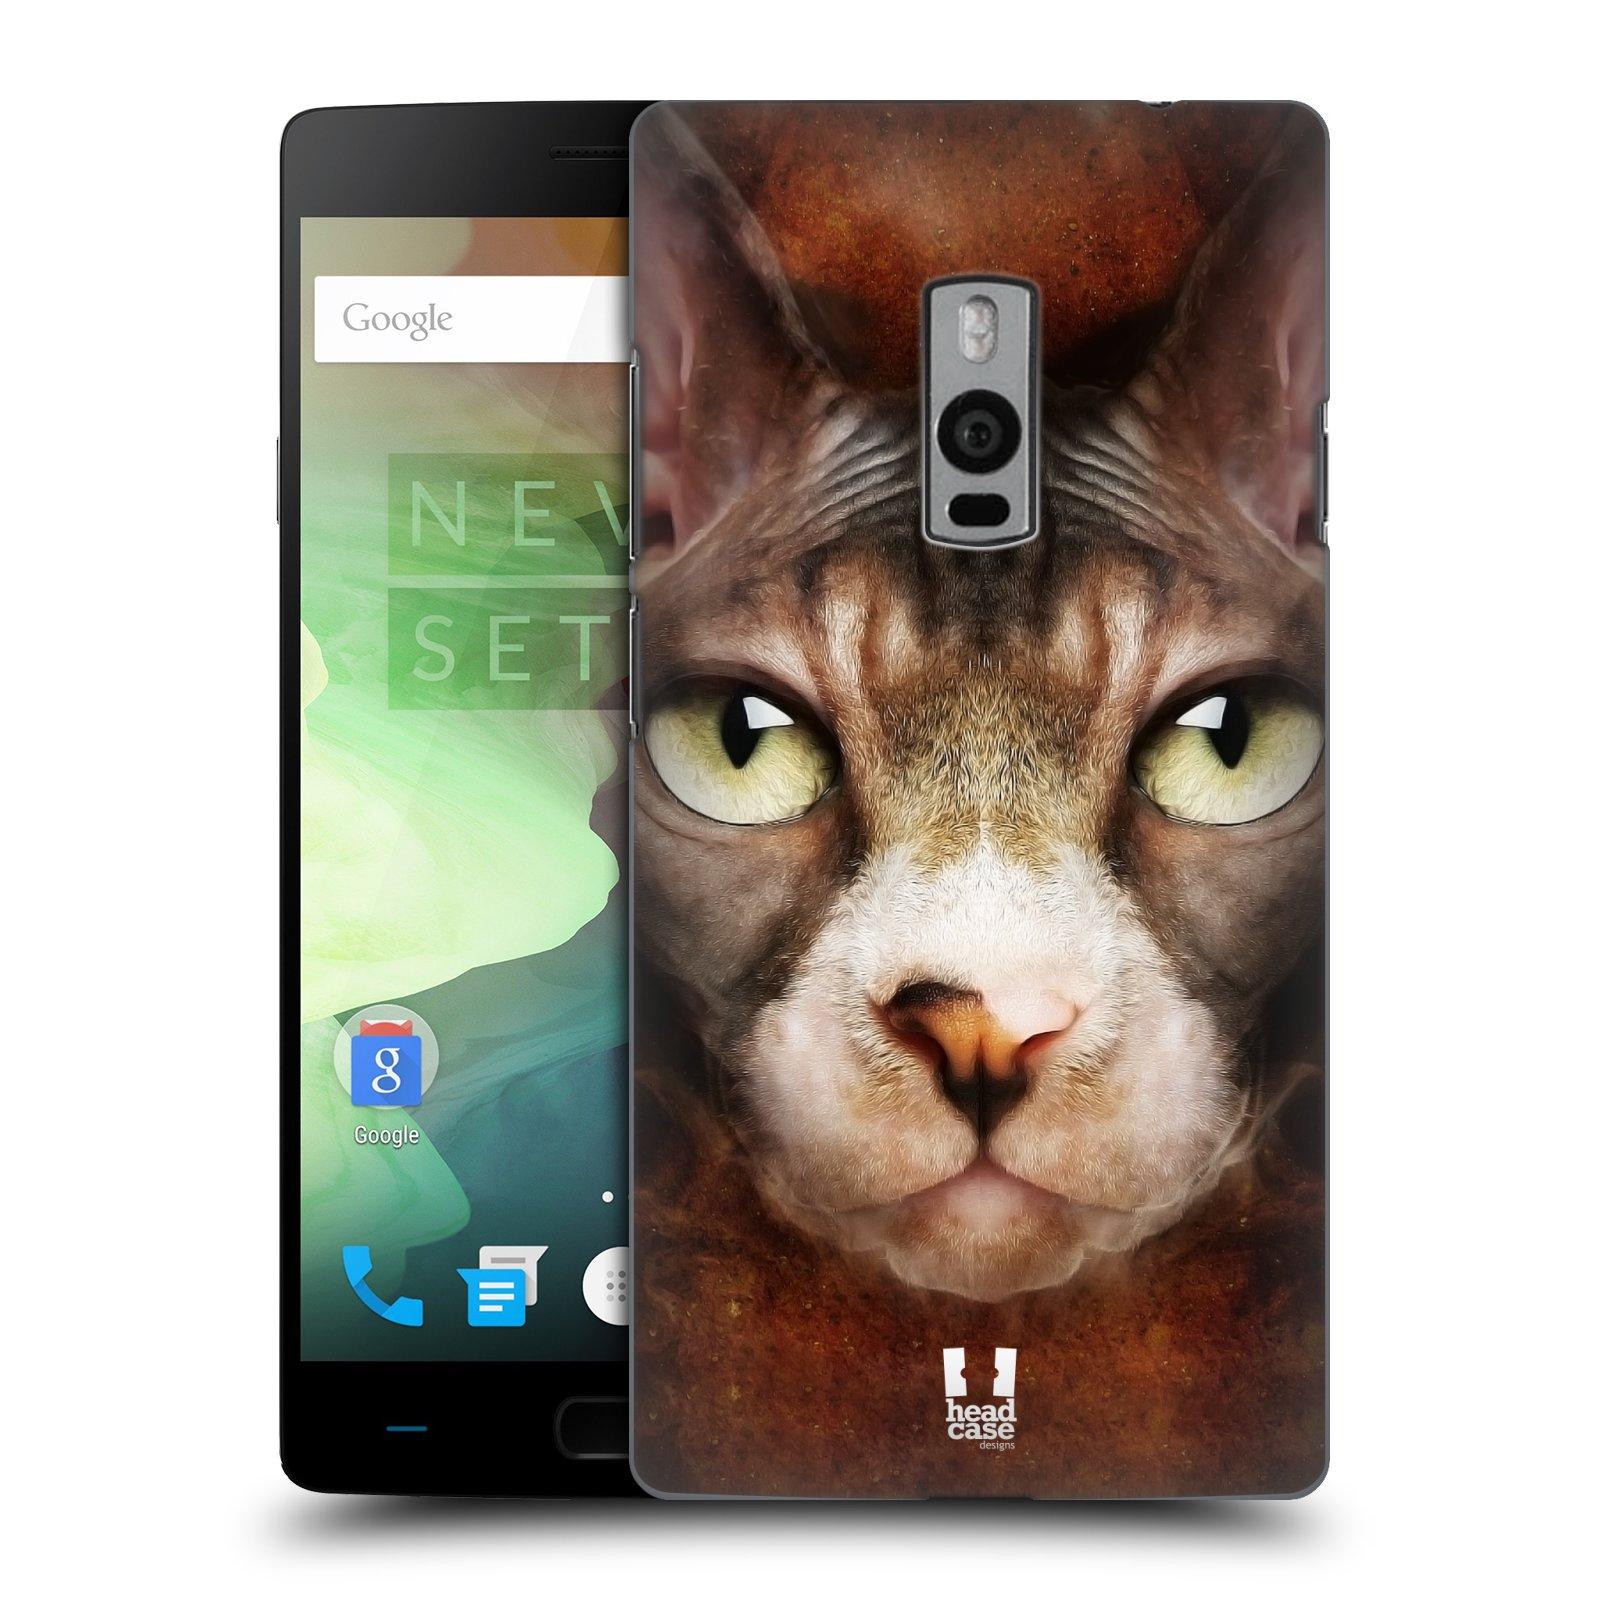 HEAD CASE pevný plastový obal na mobil OnePlus 2  ( TWO ) vzor Zvířecí tváře kočka sphynx